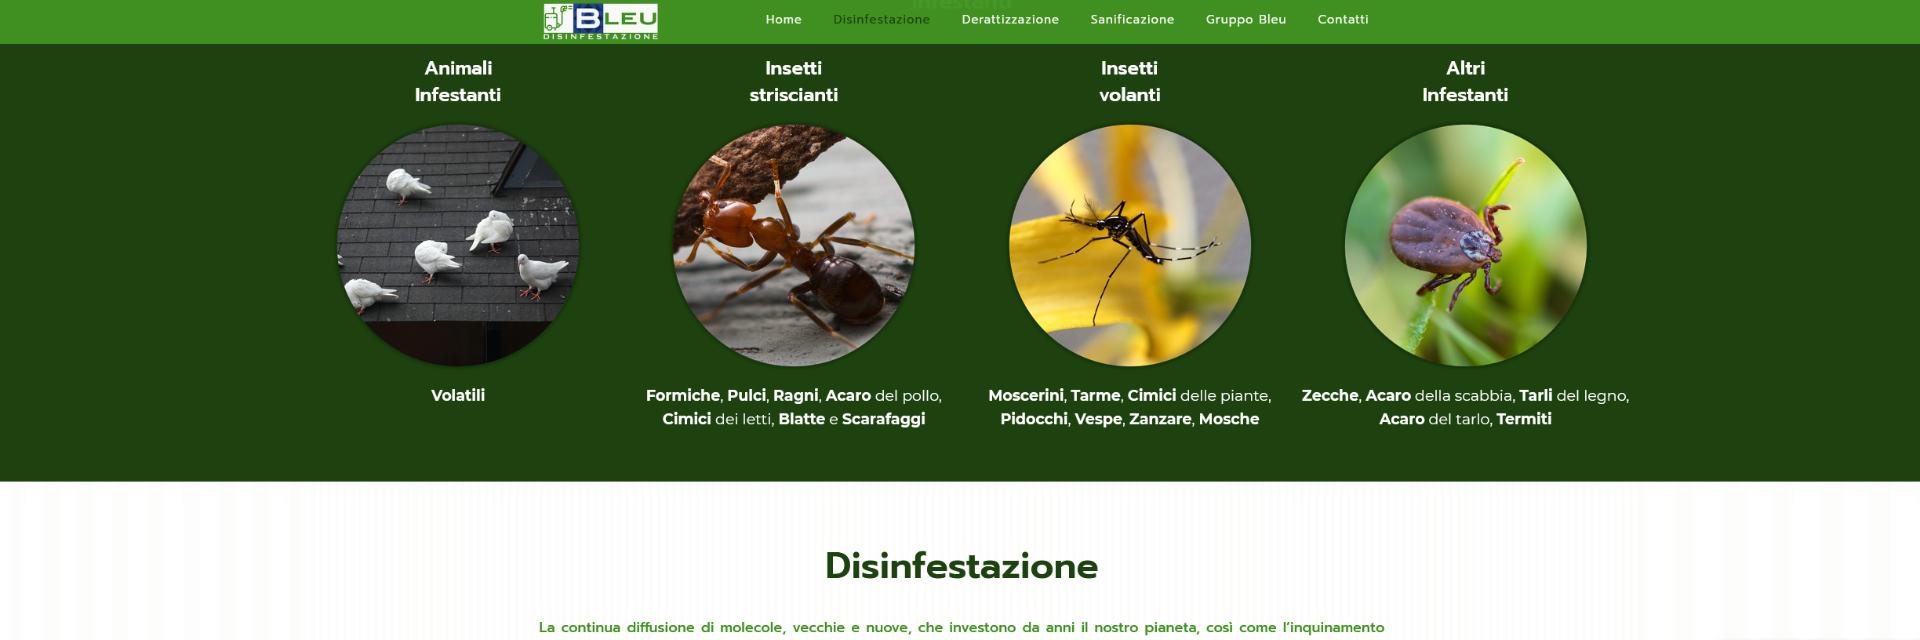 1920x640_screen_www-bleudisinfestazione-3